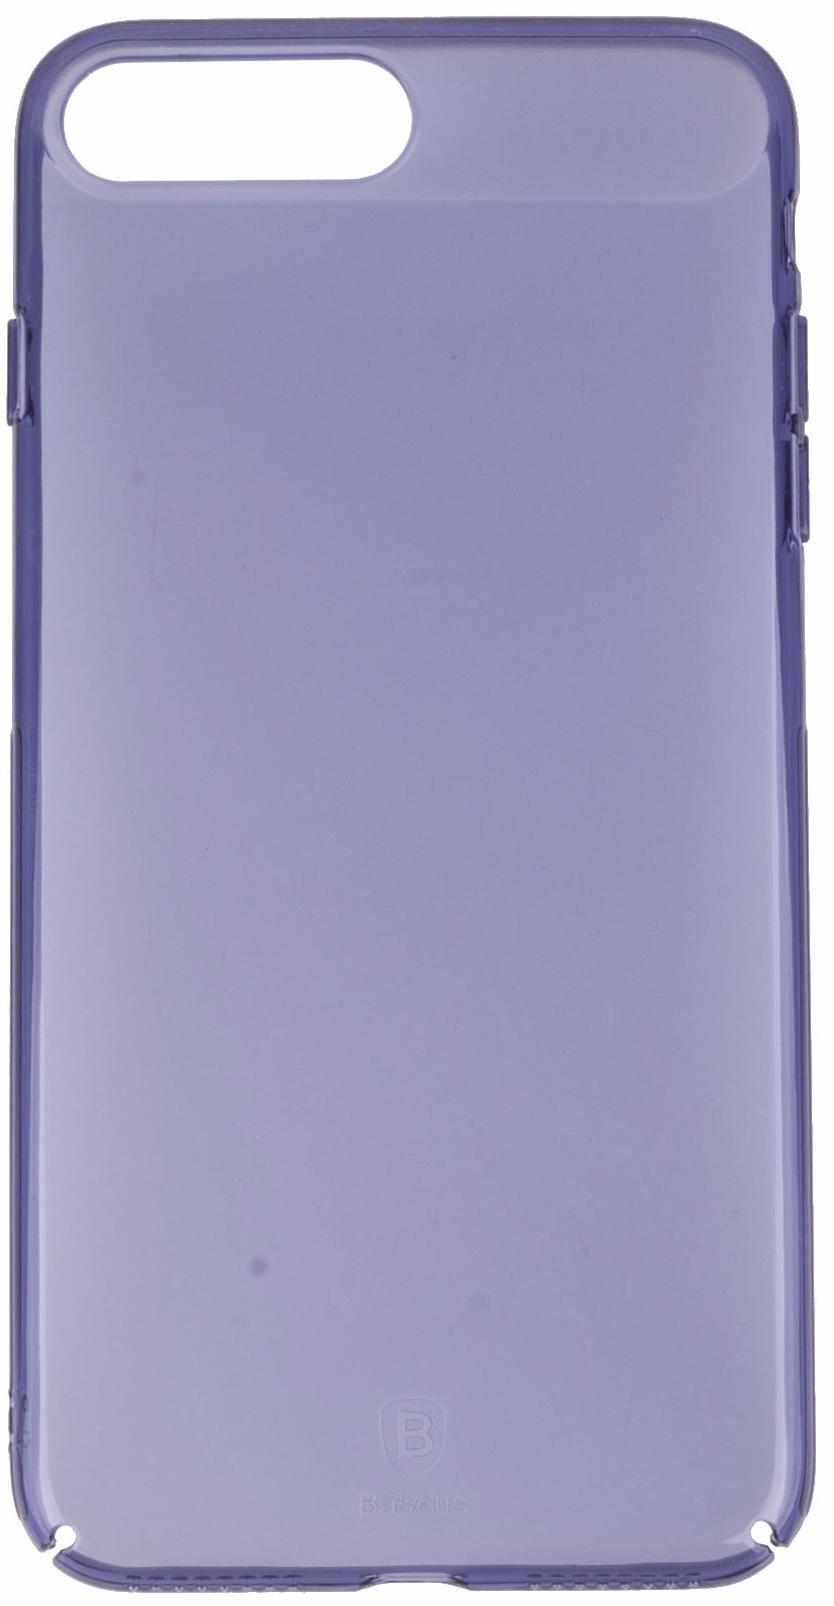 Чехол Baseus Sky Case для iPhone 7 Plus (Transparent Blue)